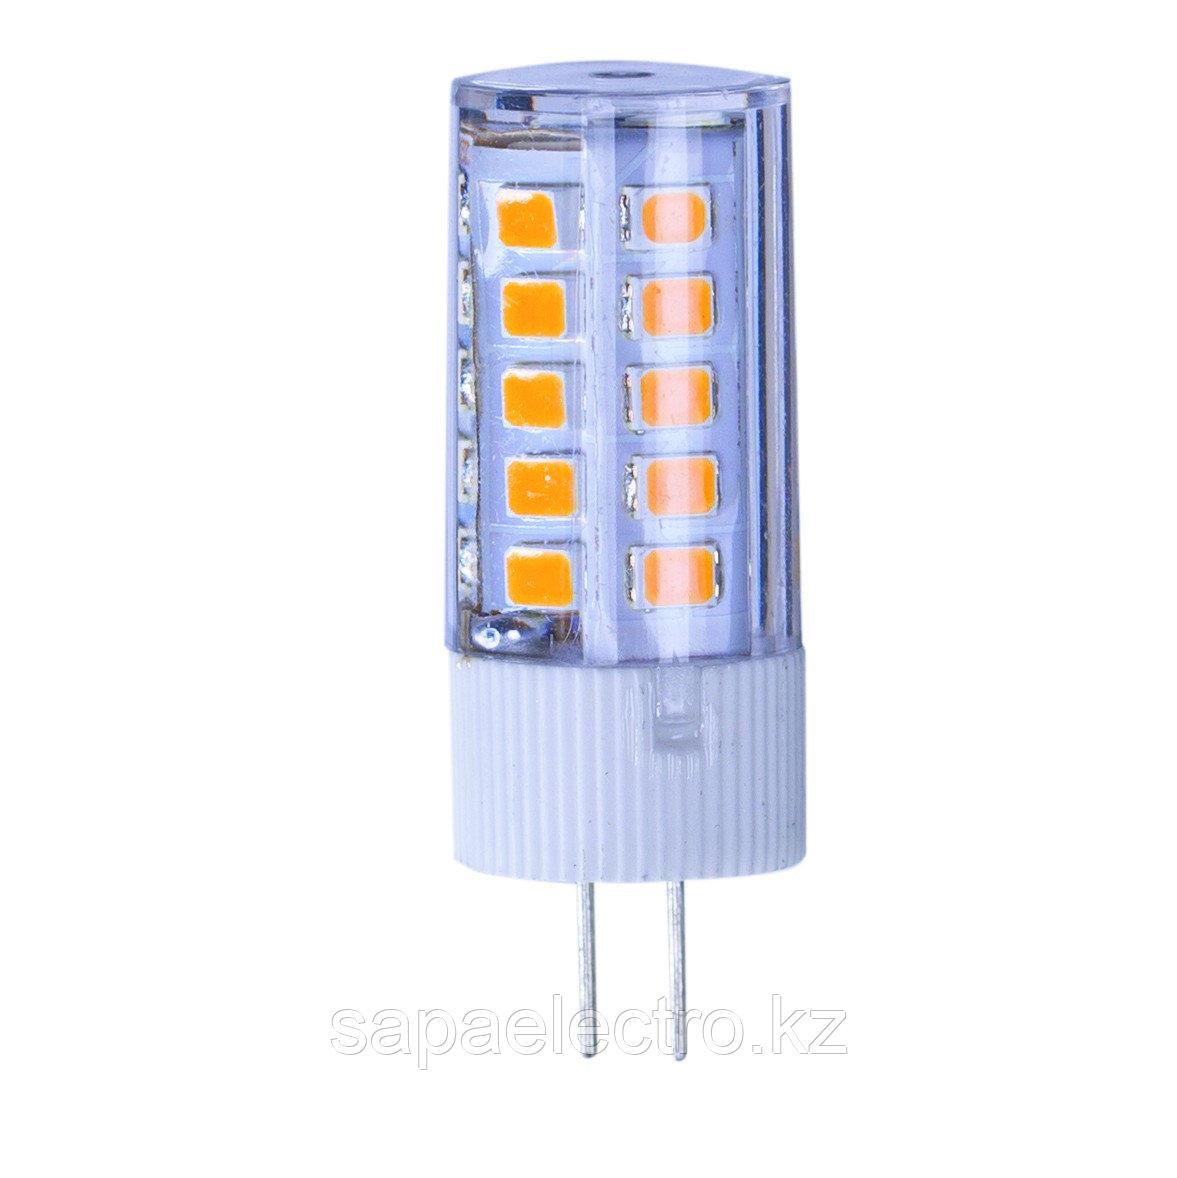 Lampa KAPSUL LED G4 3,5W 350LM 3000K (TL)500